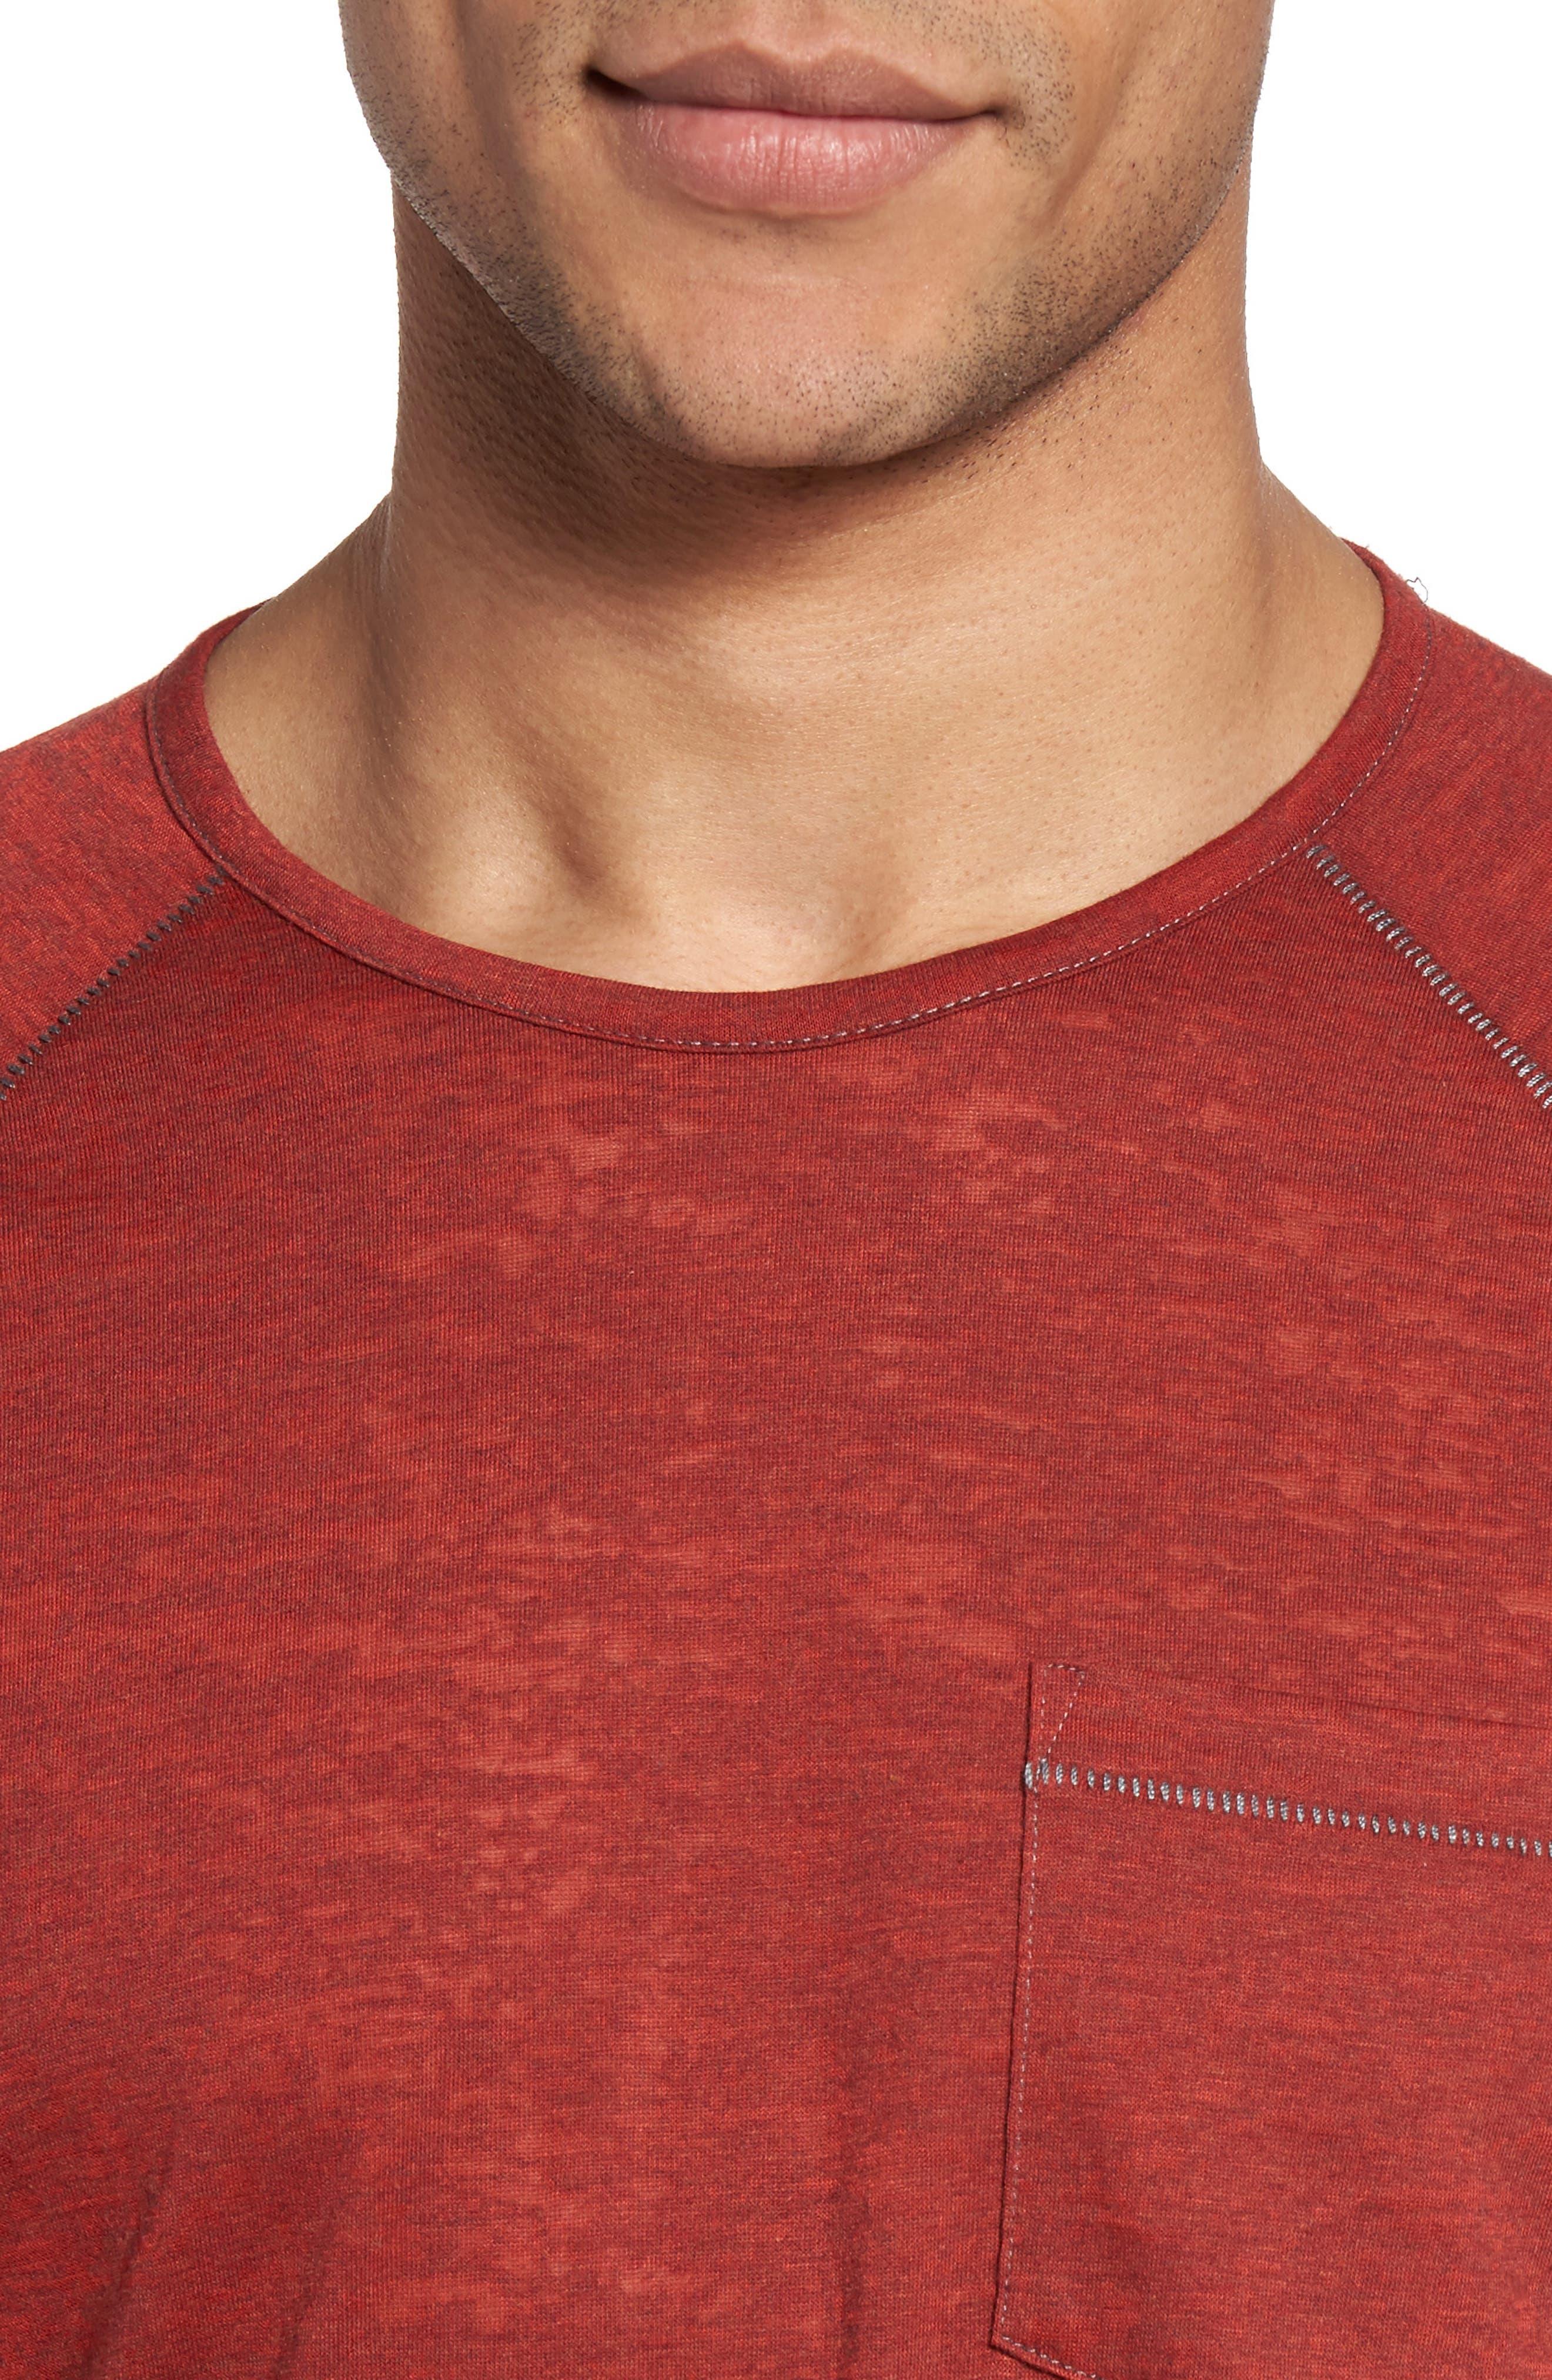 Raglan Sleeve T-Shirt,                             Alternate thumbnail 4, color,                             Tomato